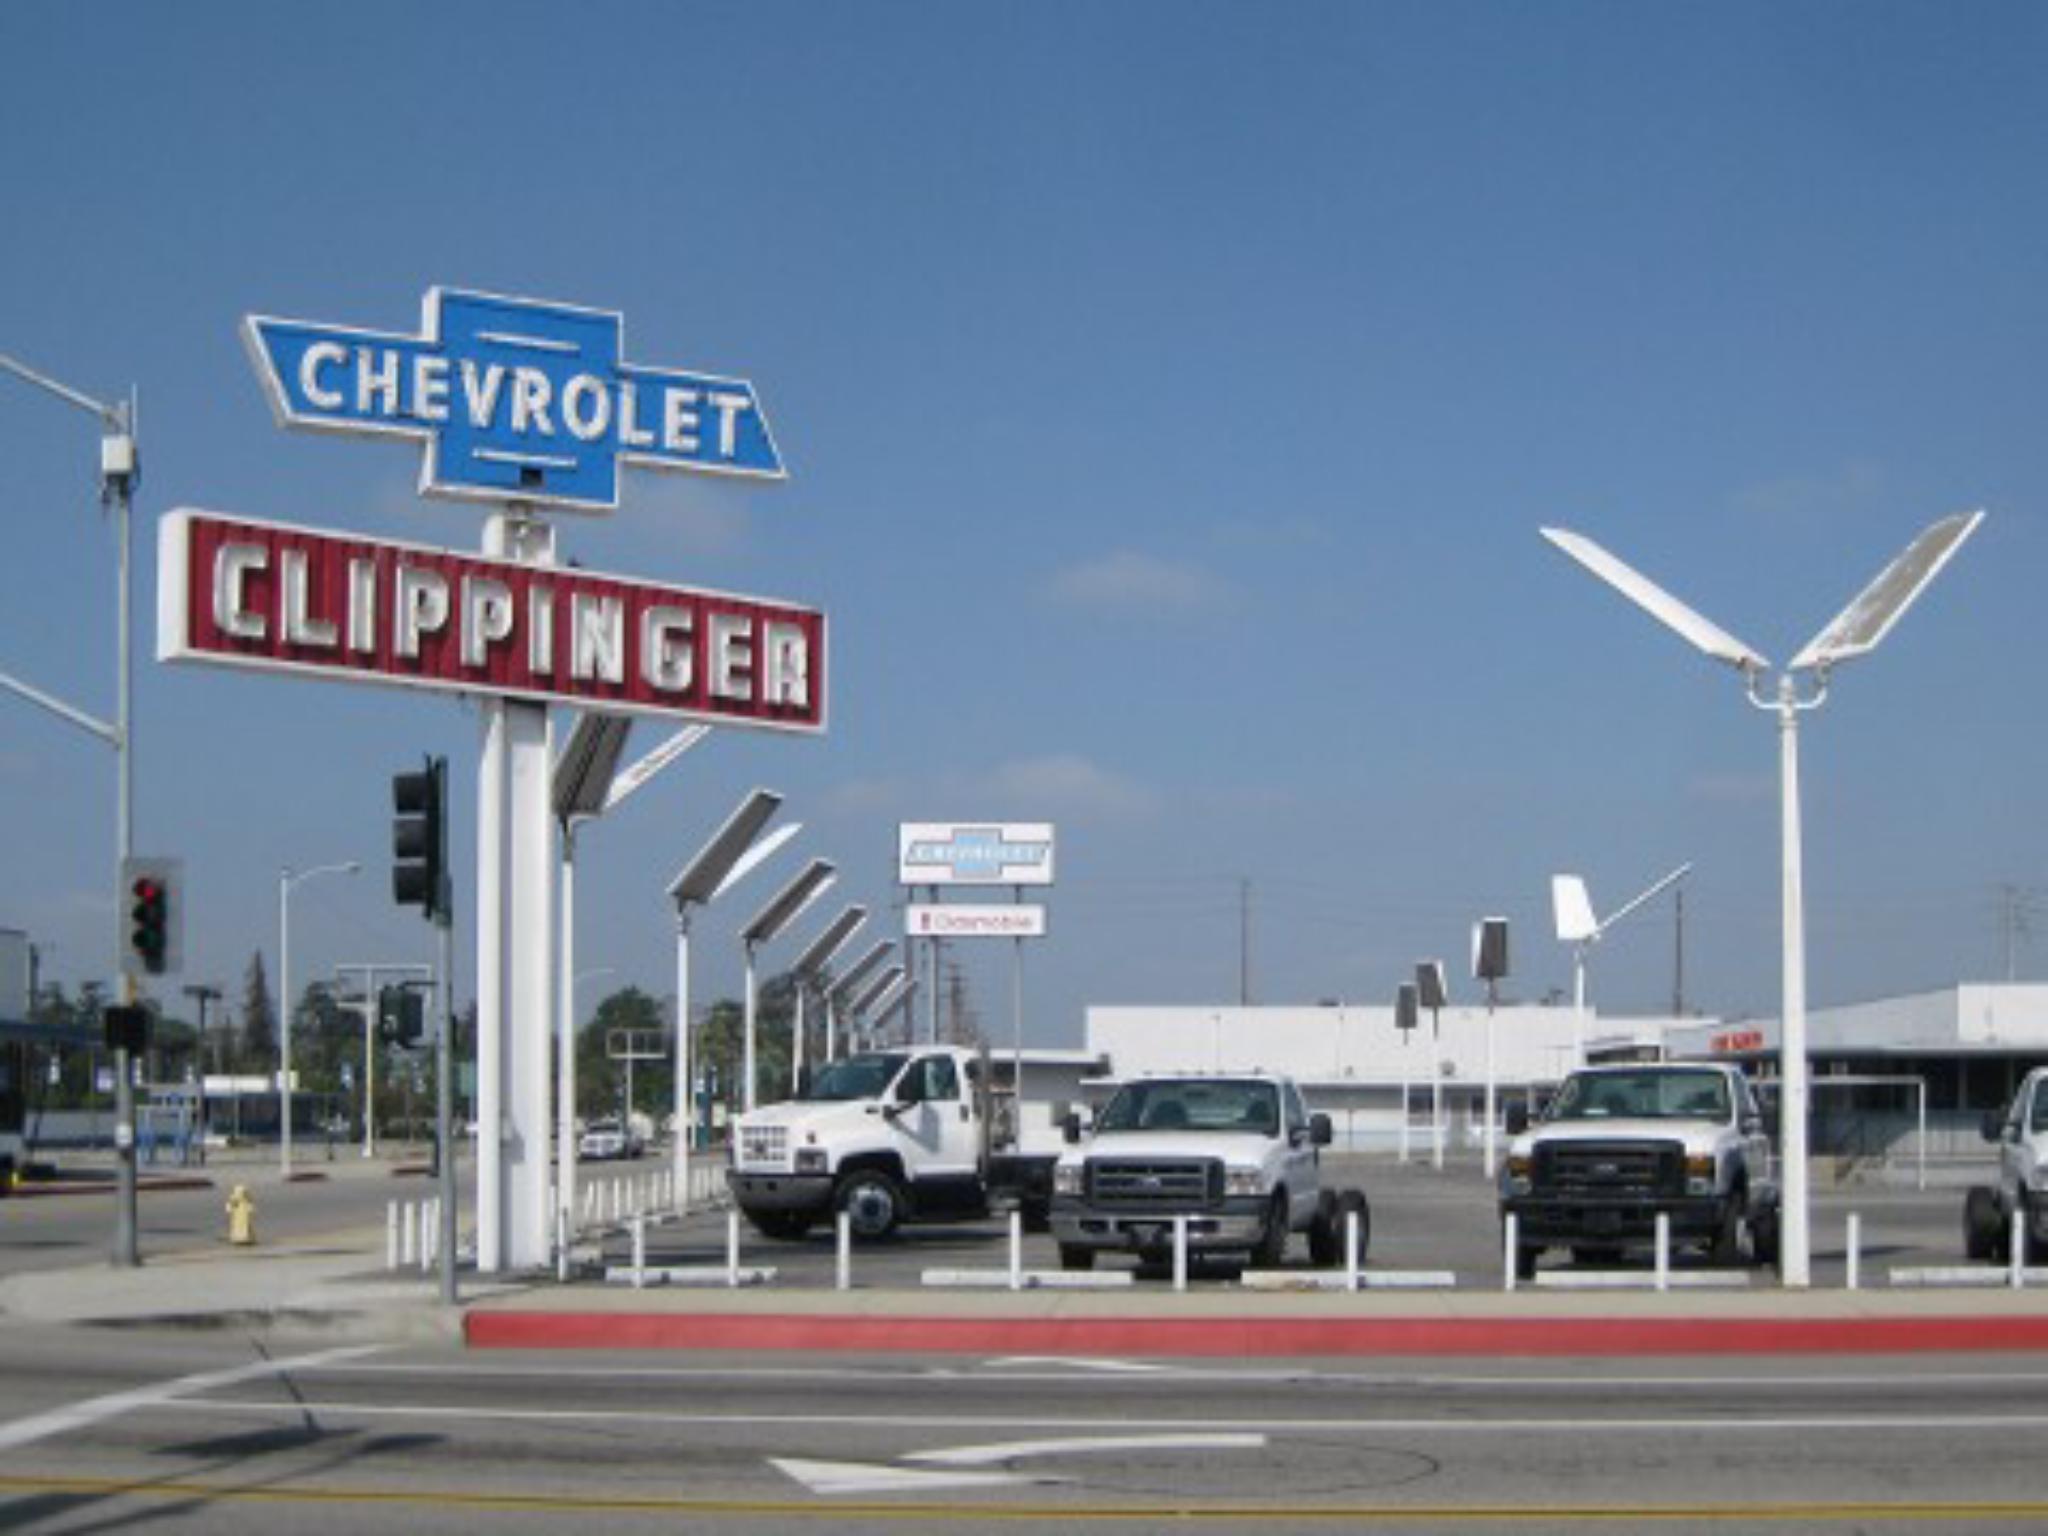 Clippinger Chevrolet Dealership Covina California Chevrolet